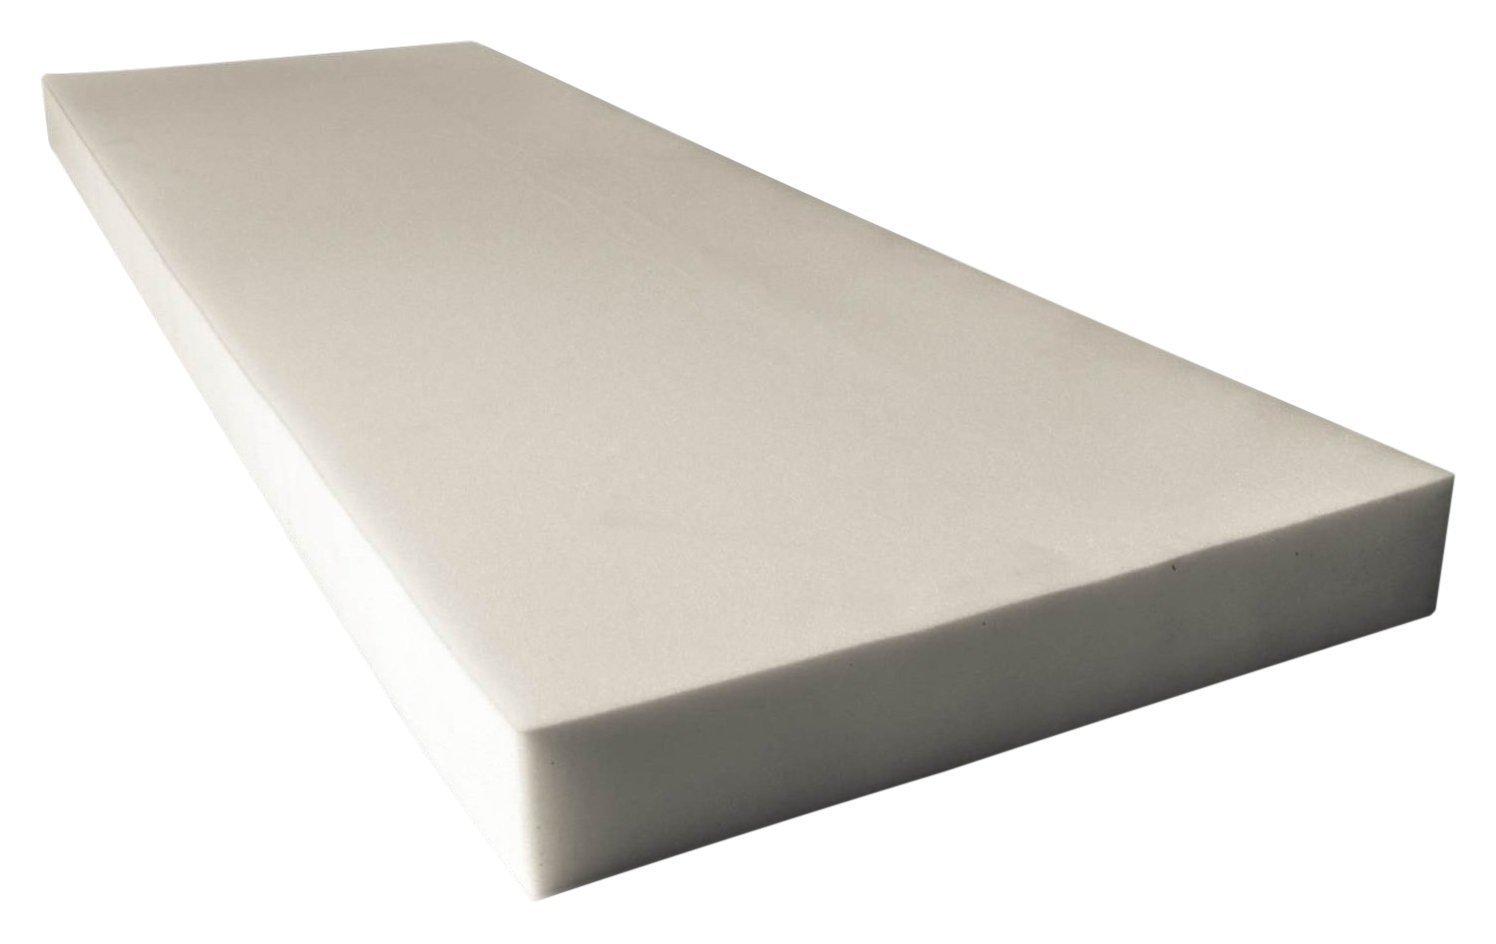 Mybeca Upholstery Foam 2